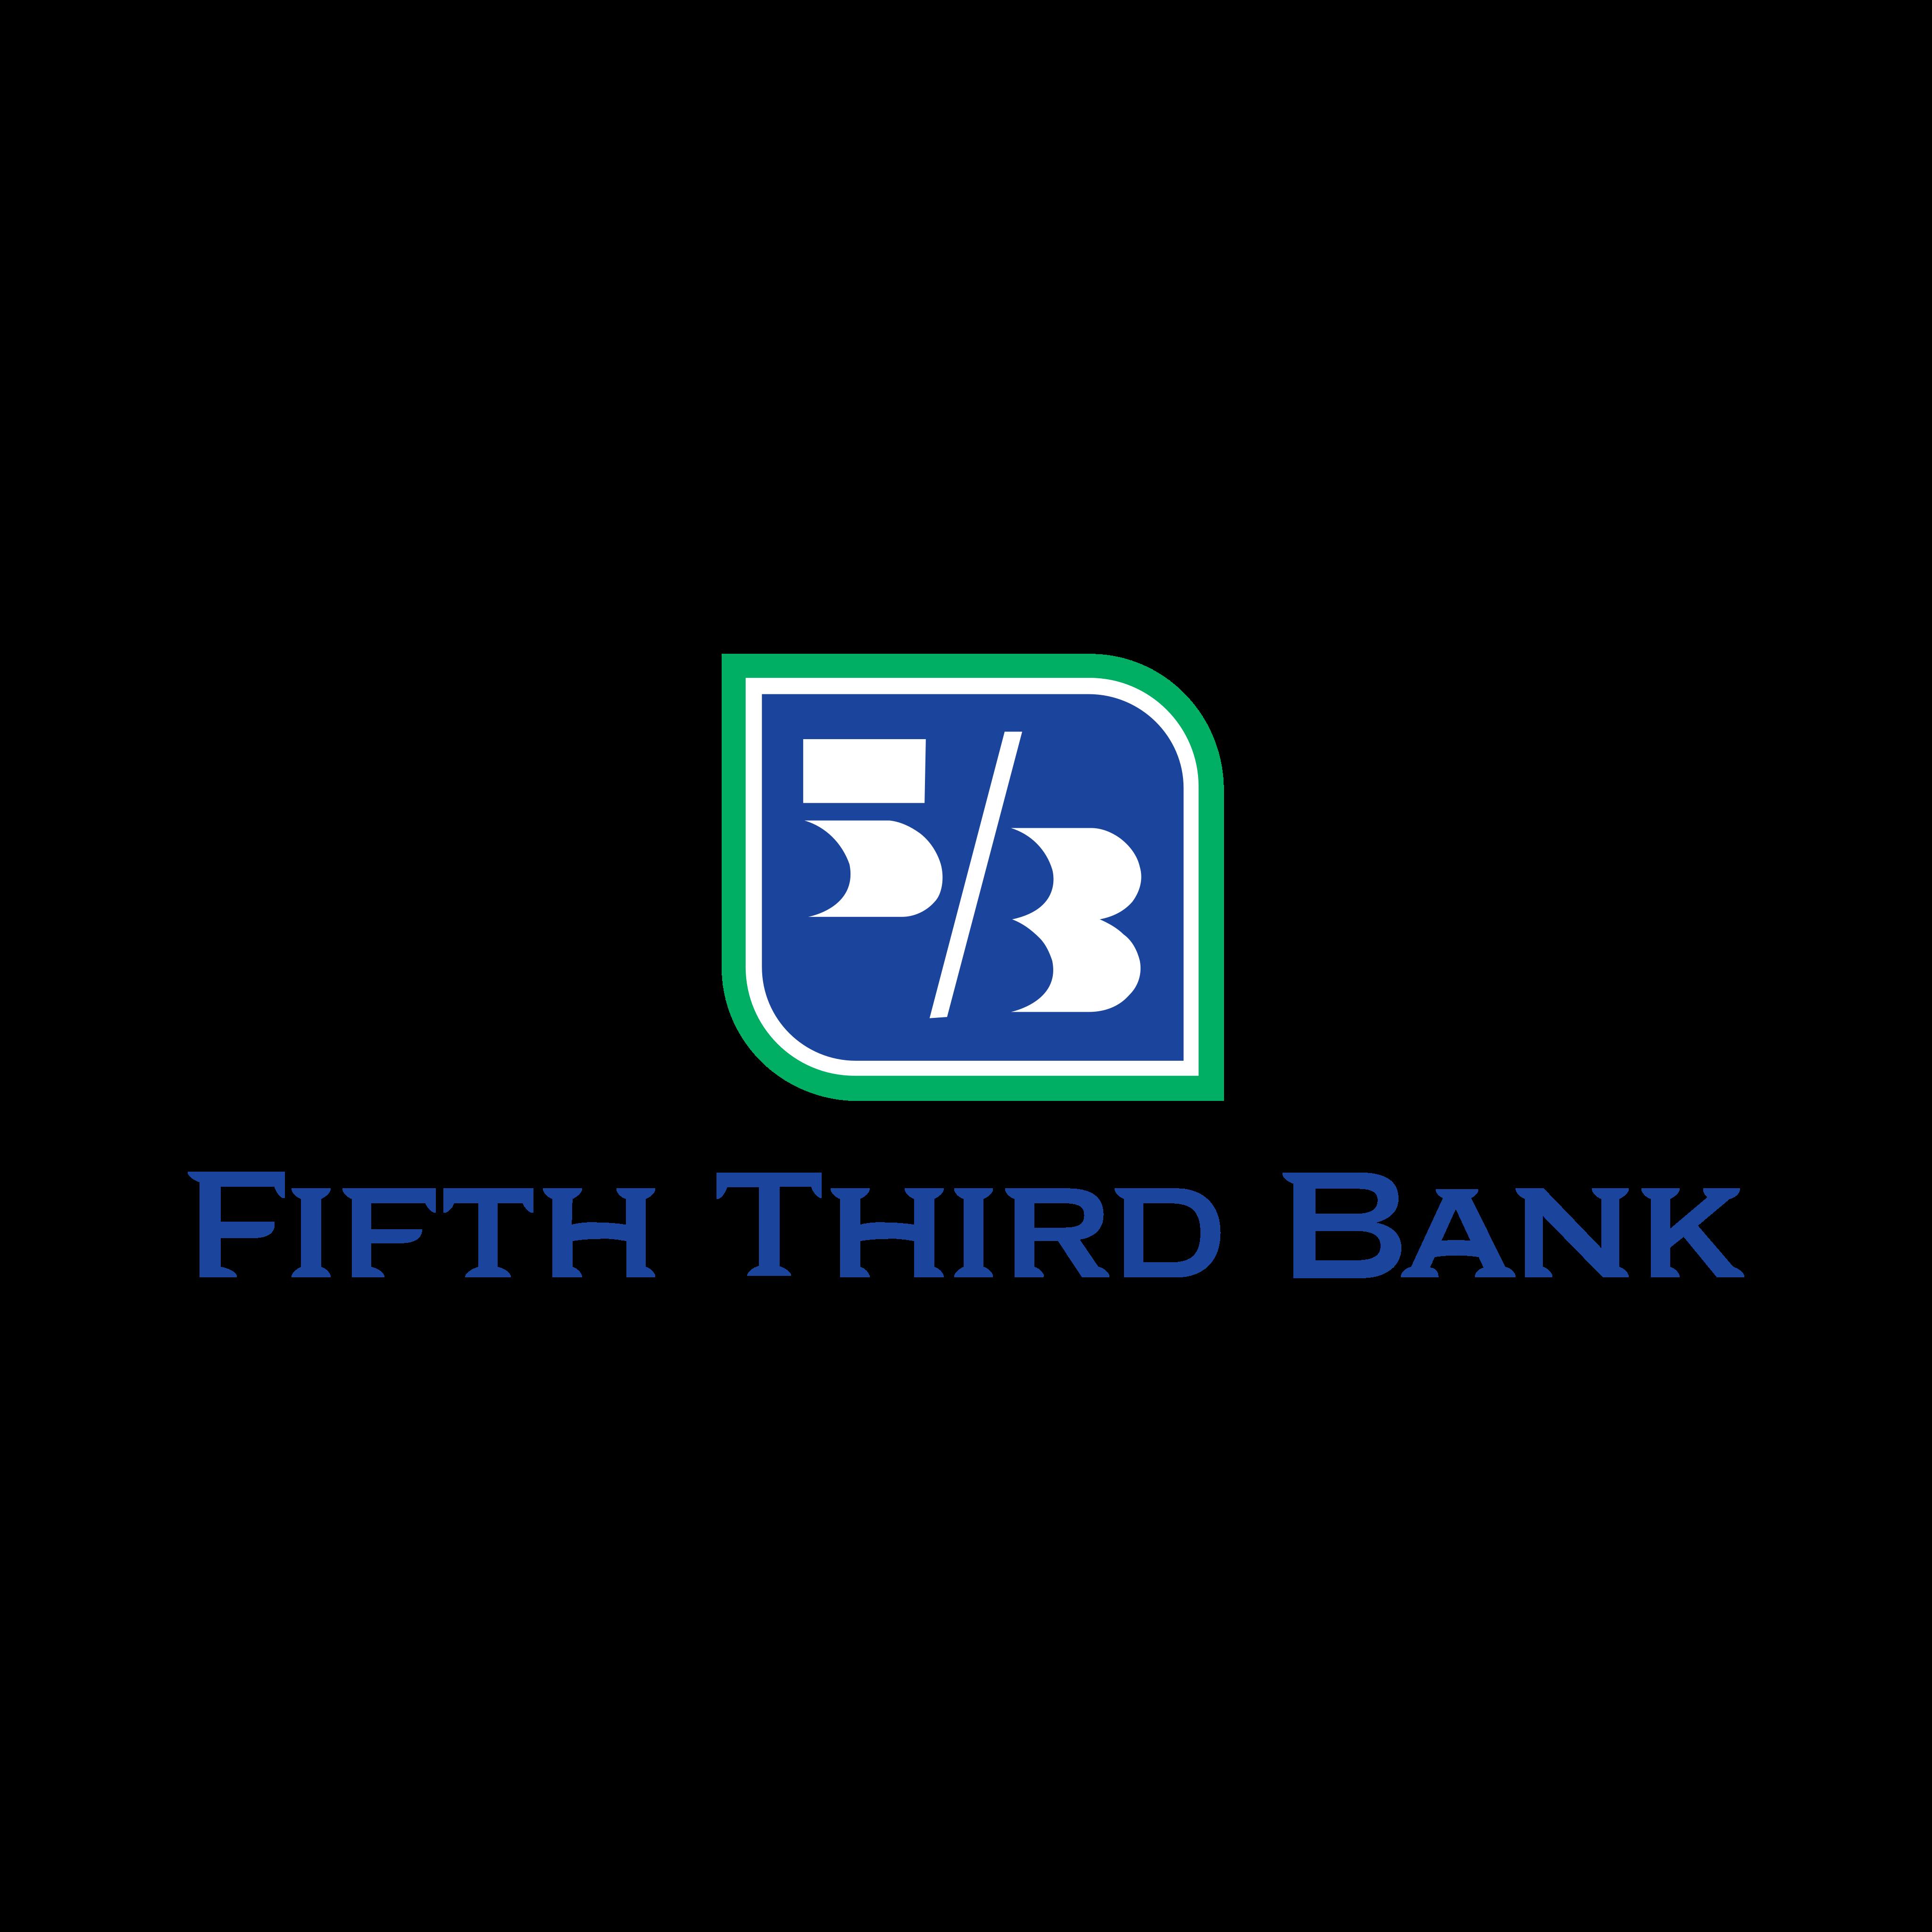 fifth third bank logo 0 - Fifth Third Bank Logo